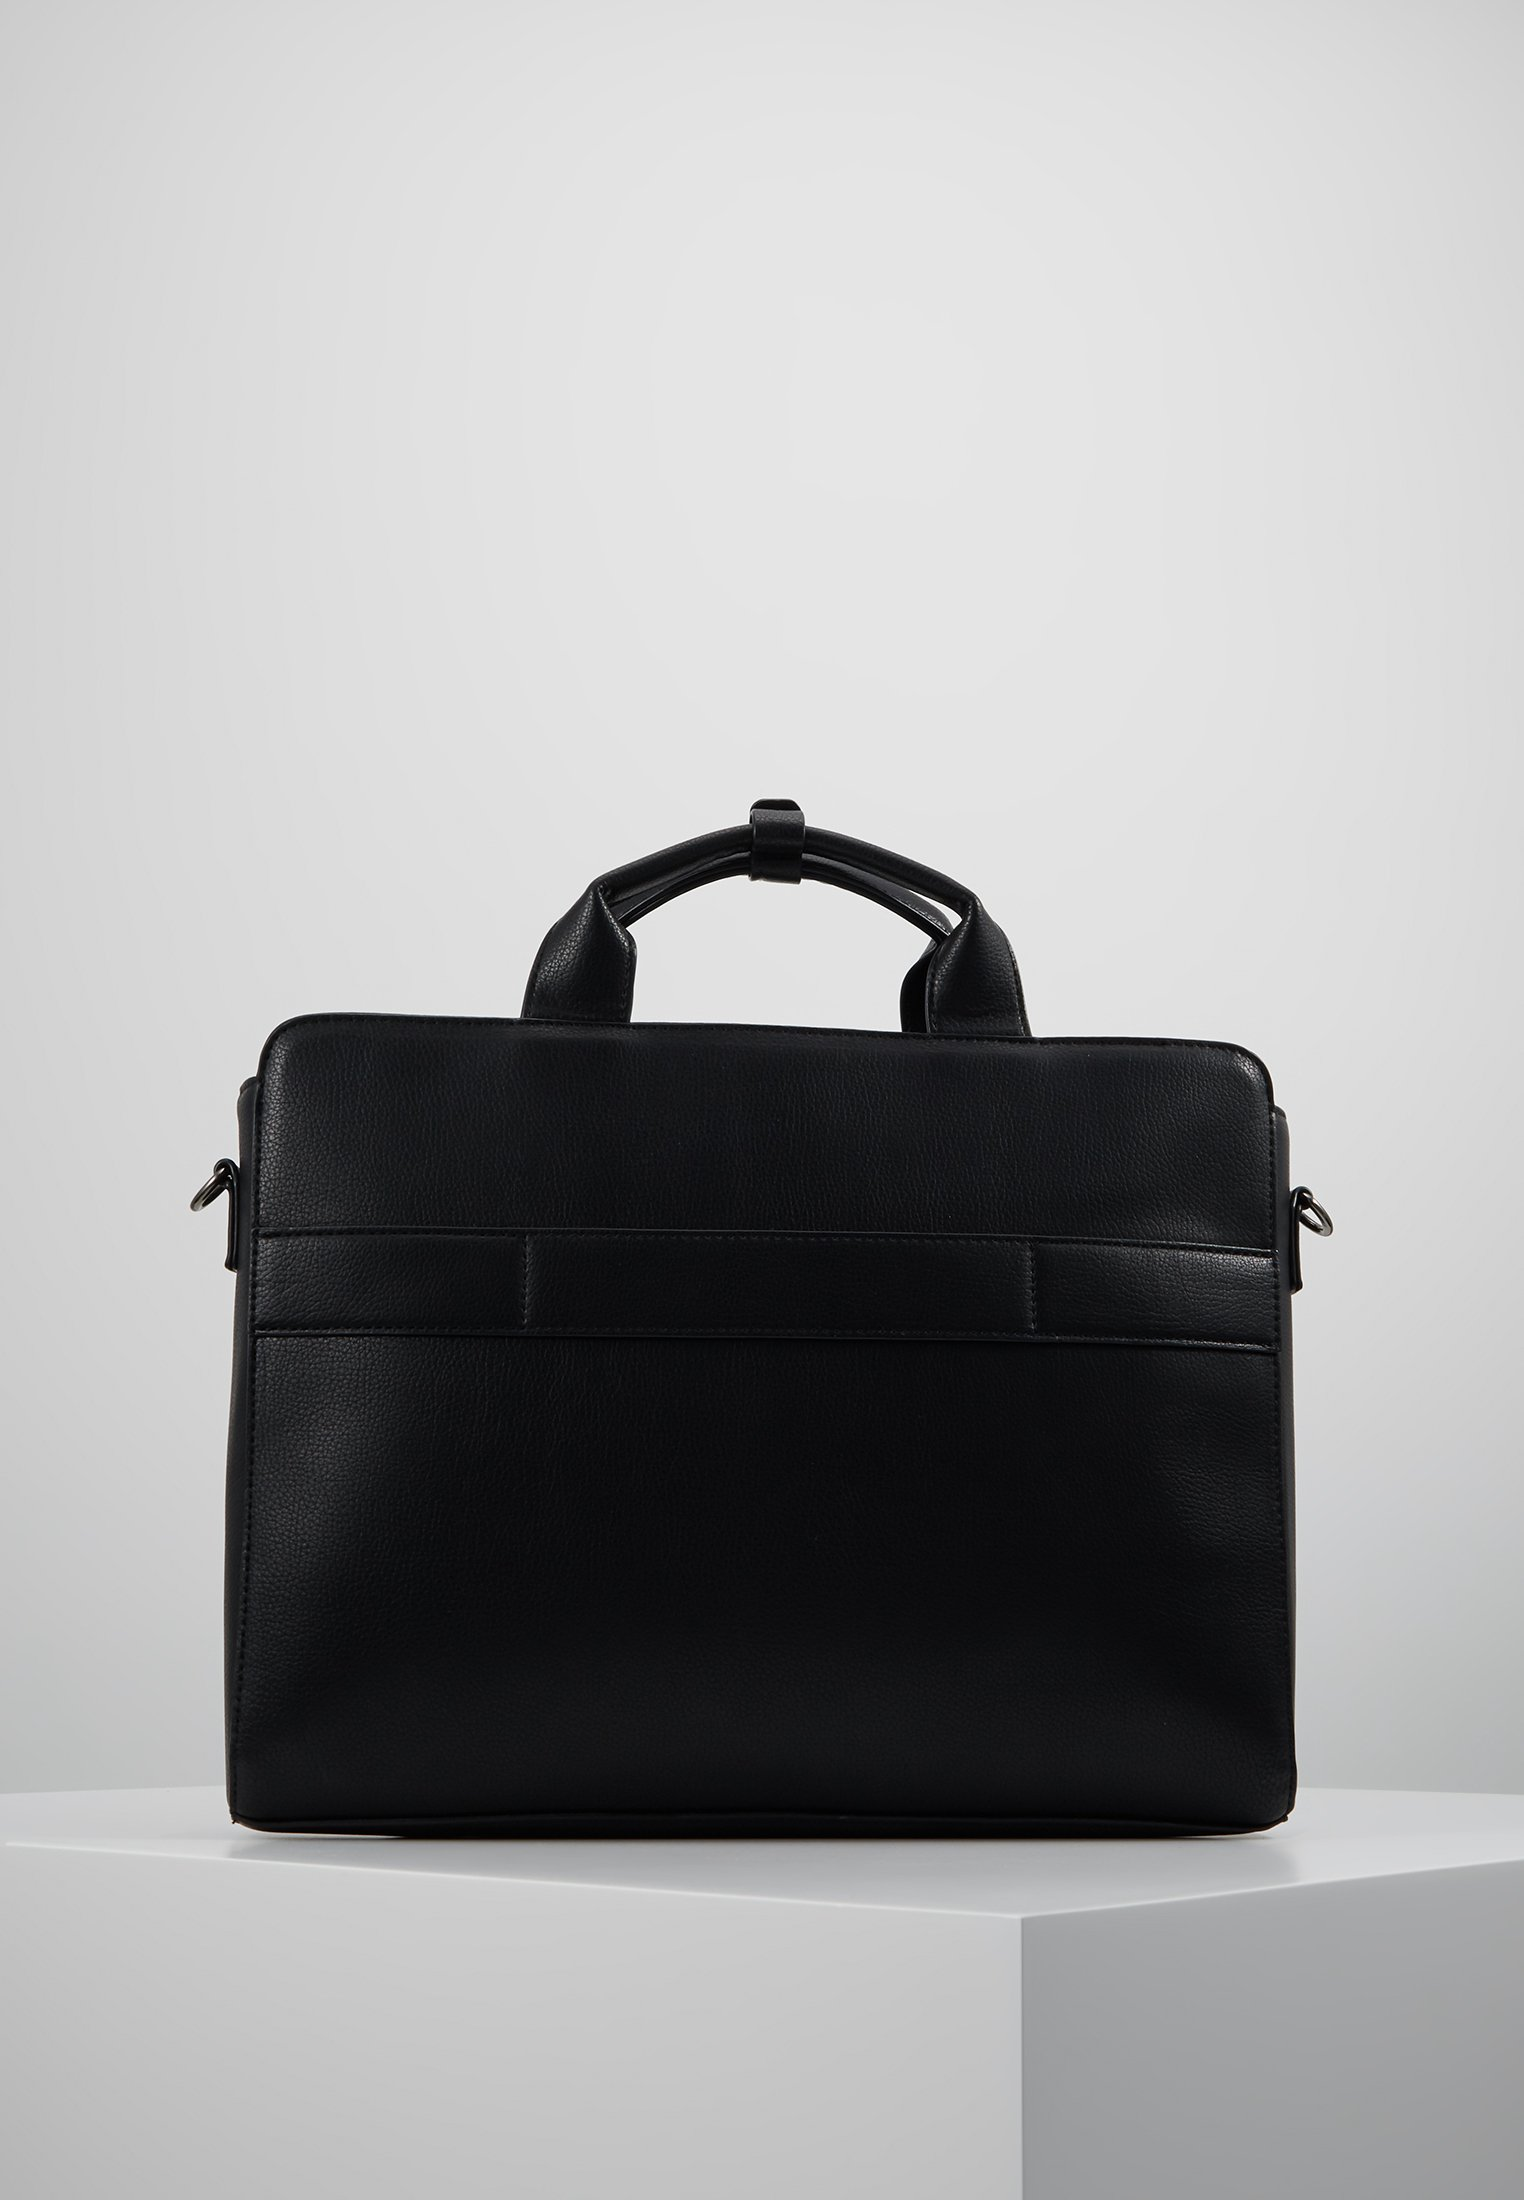 Pier One Mallette - Black